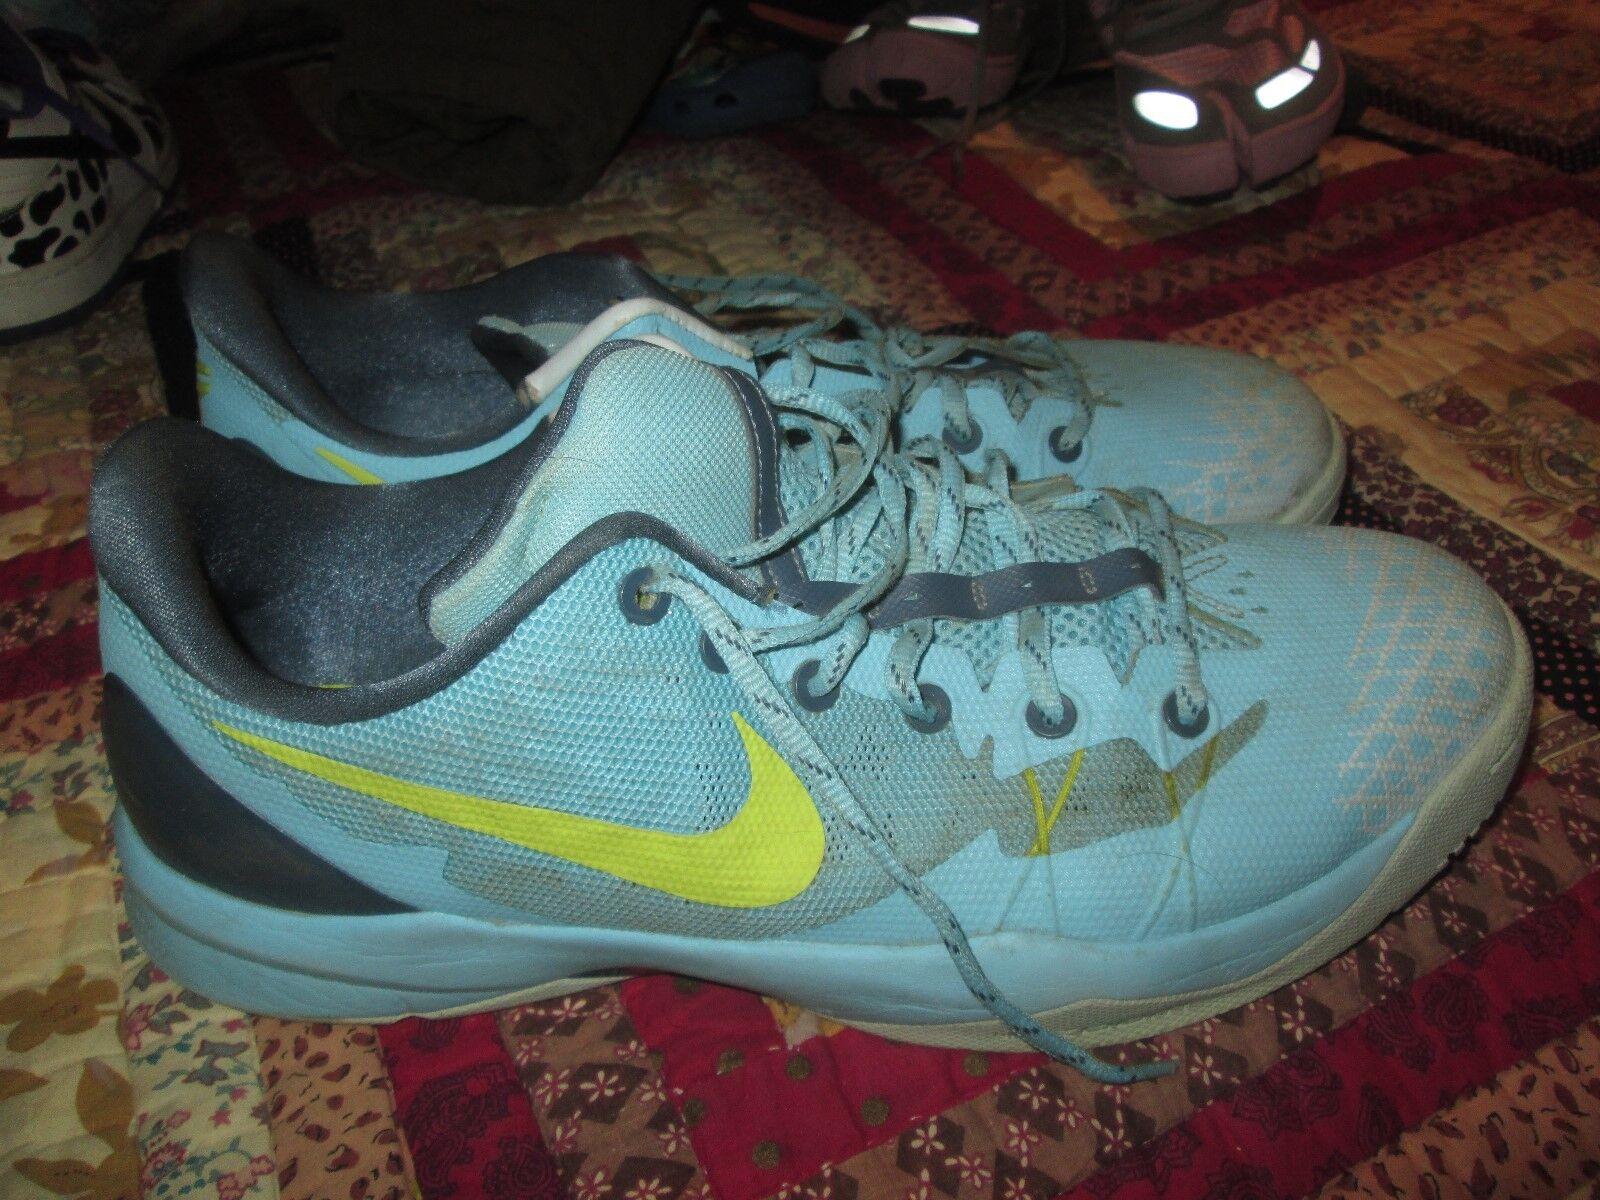 Nike Zoom Kobe Venomenon 4 Basketball Mens Shoes 635578-400 Polarized Blue Mens Basketball 13 933594